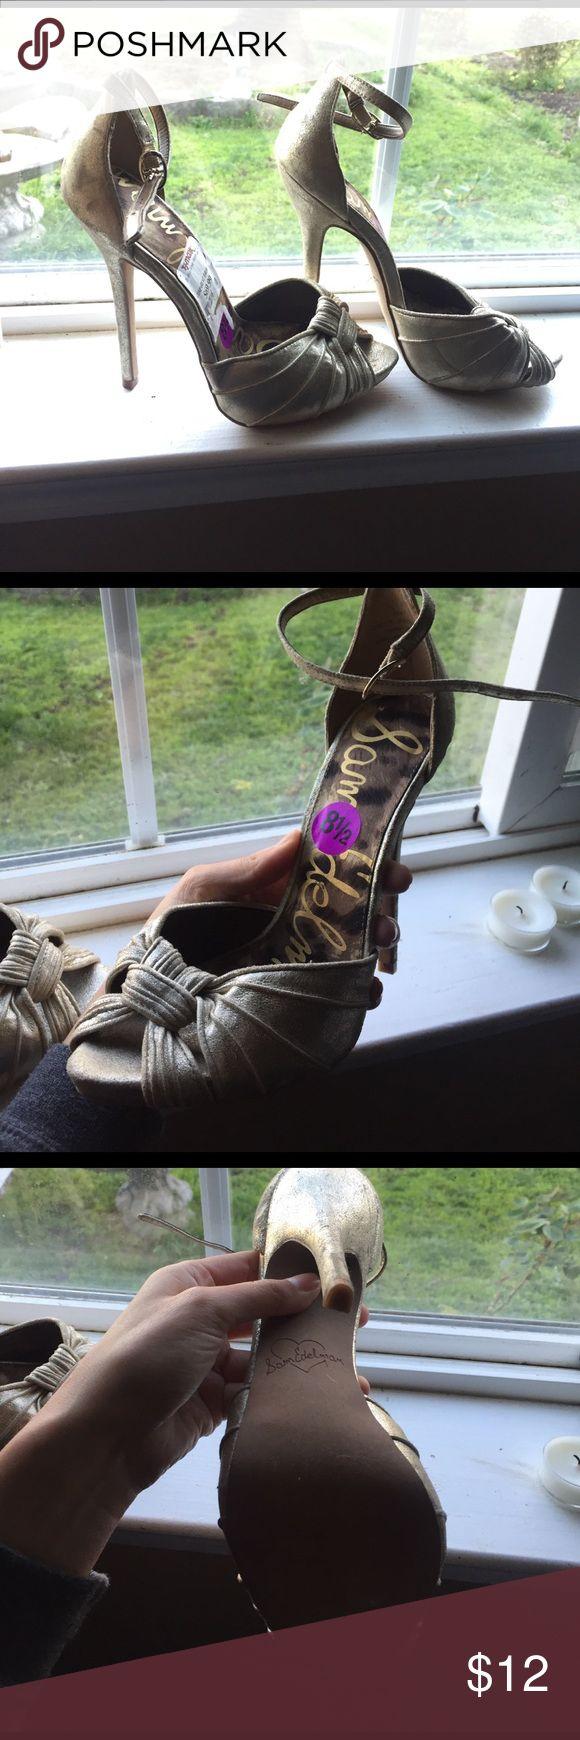 Sam Edelman Heels Never worn! Sam Edelman Shoes Heels